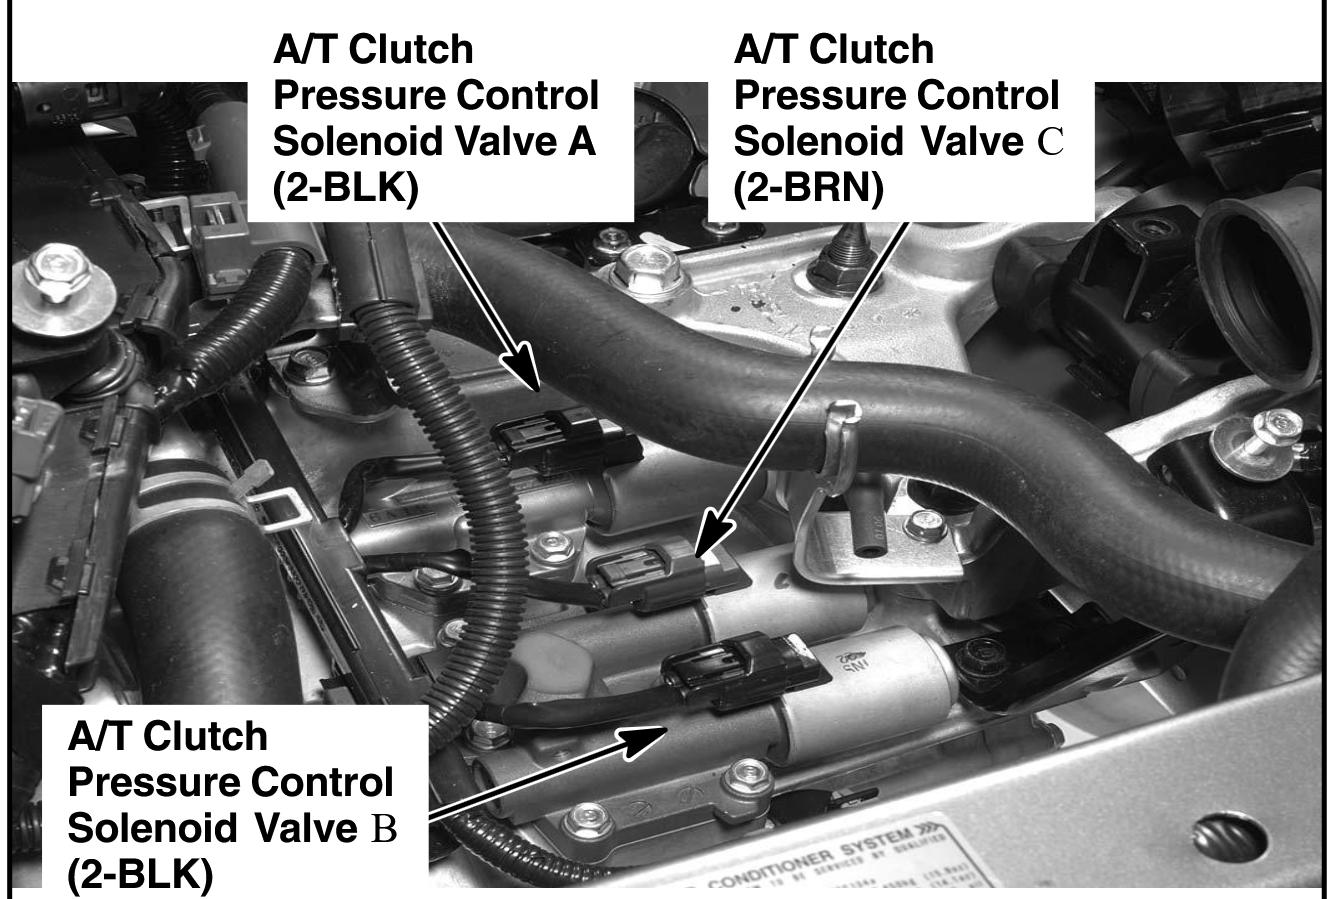 2007 Honda Fit Sport, engine annunciator light on